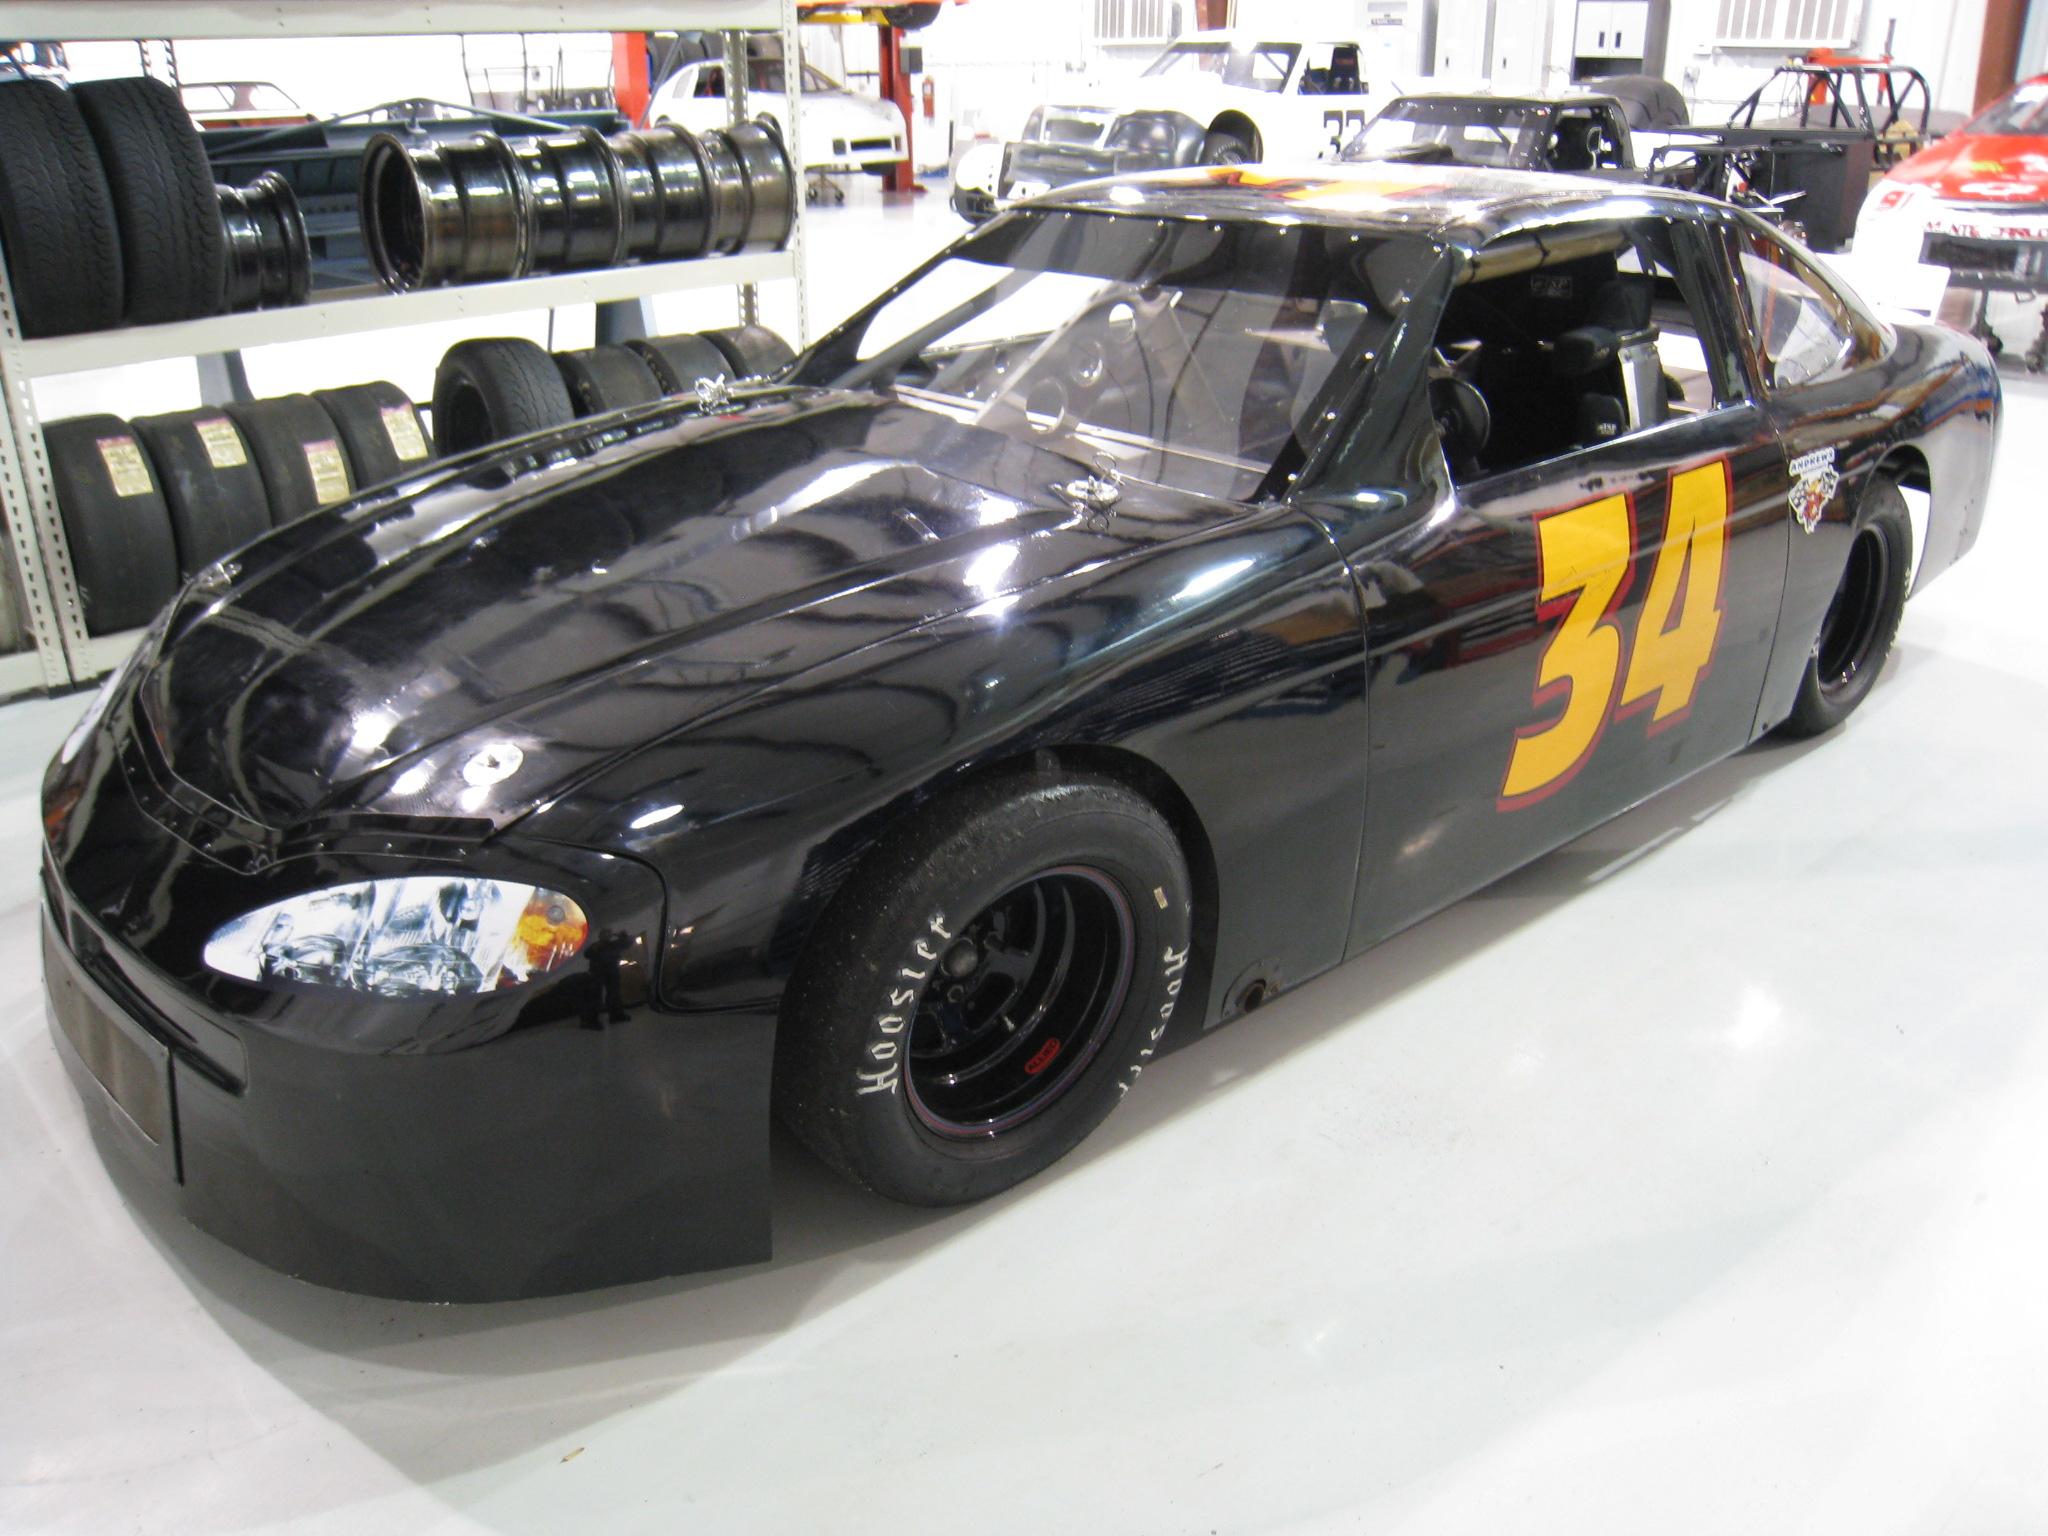 Legend Race Cars, Vintage Motorcyle, MX